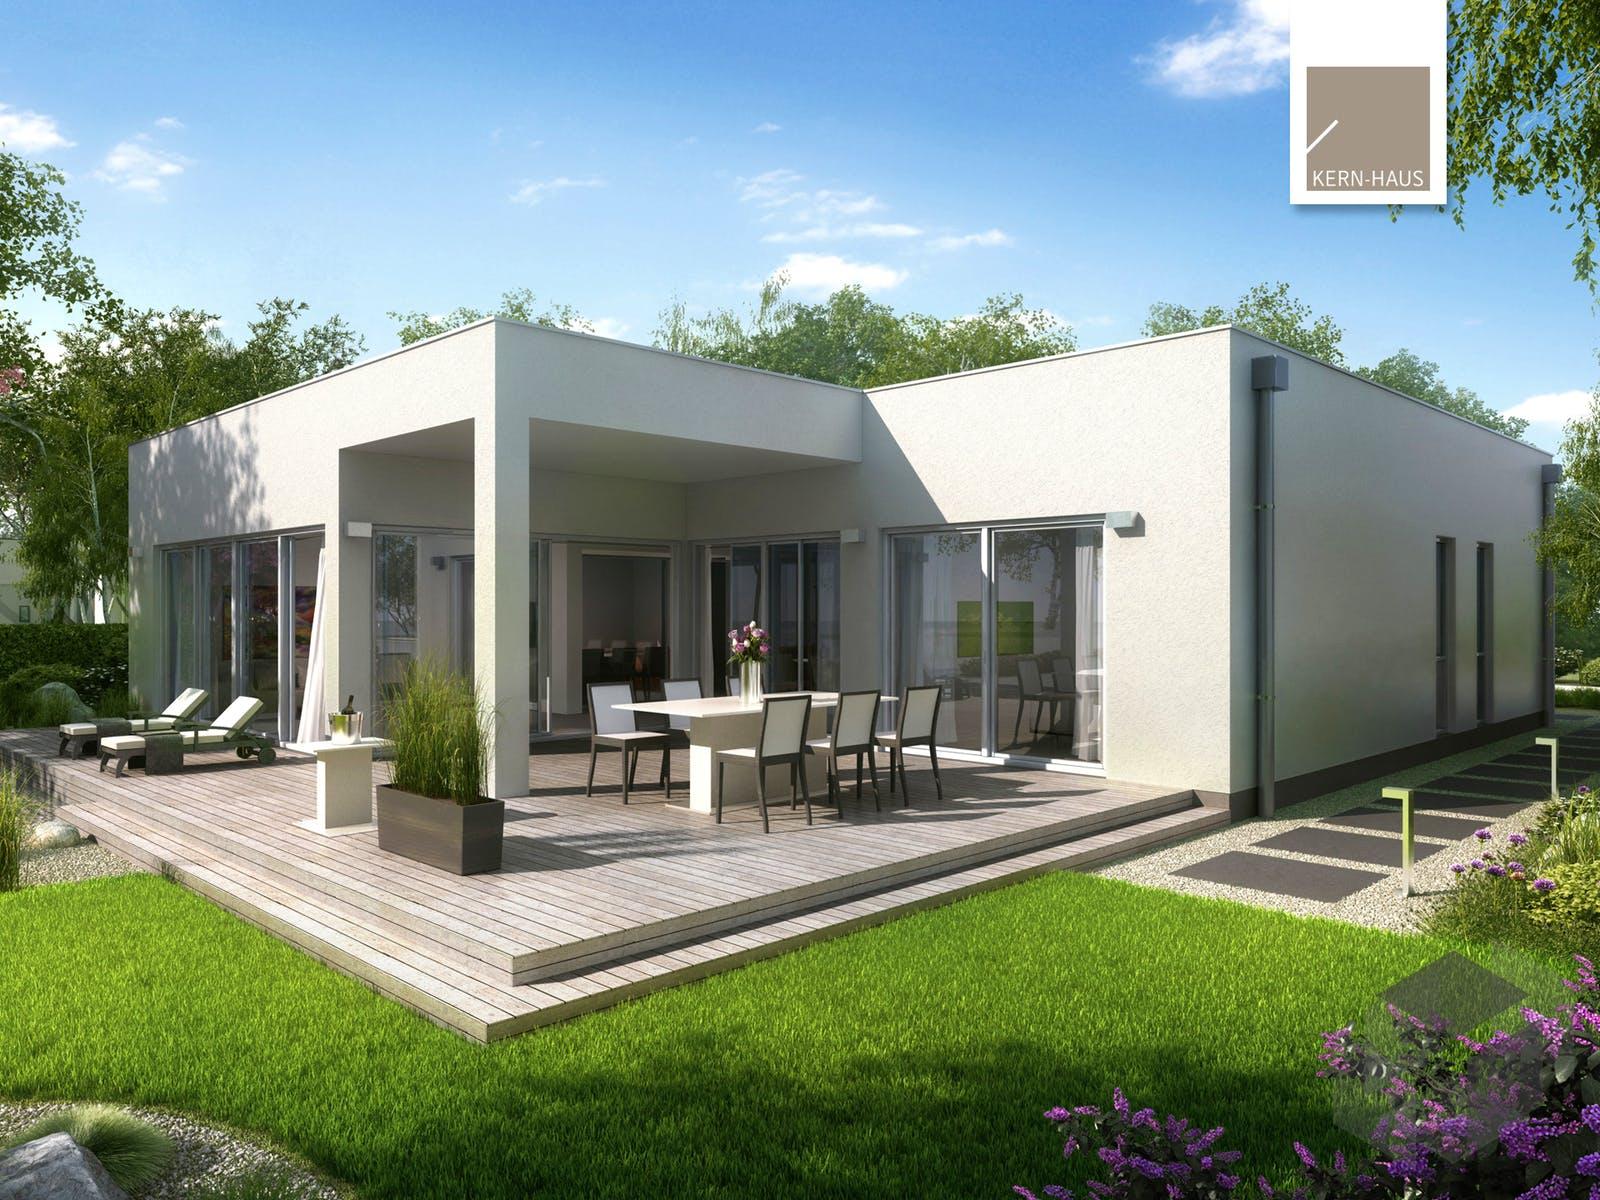 bungalow select von kern haus komplette daten bersicht. Black Bedroom Furniture Sets. Home Design Ideas